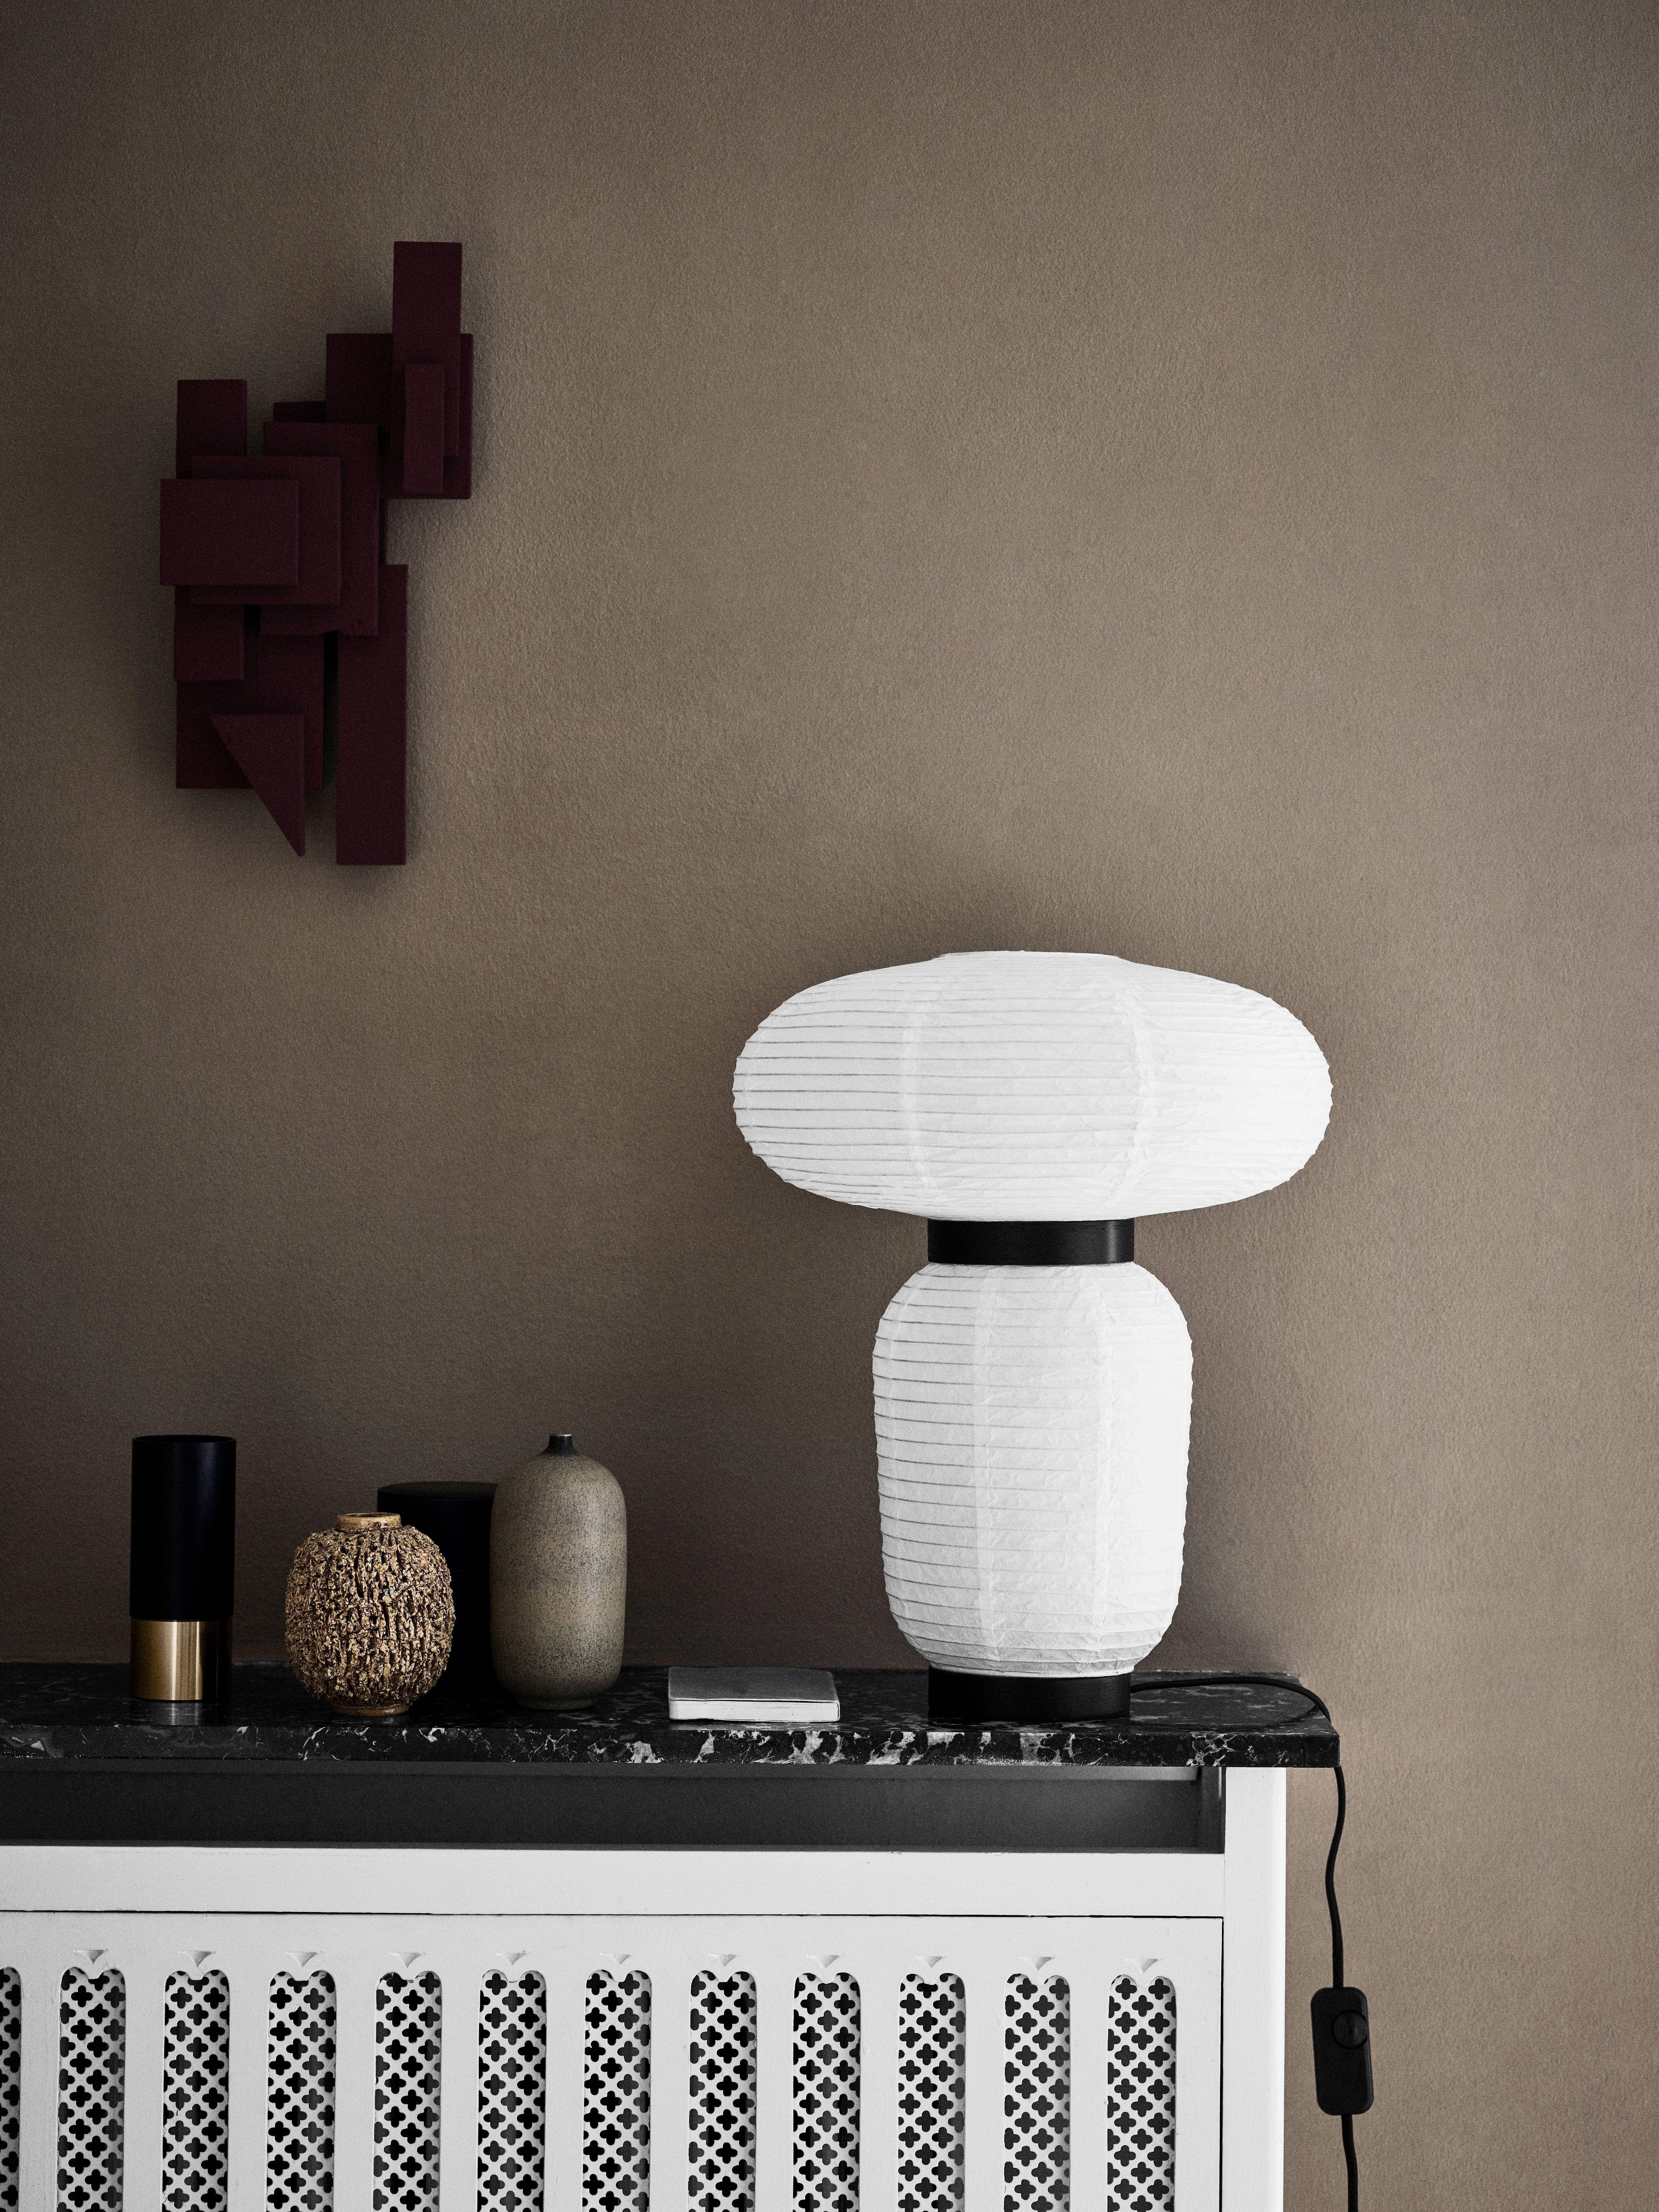 Jh18 Formakami Table Lamp In 2020 Design Table Lamp Lamp